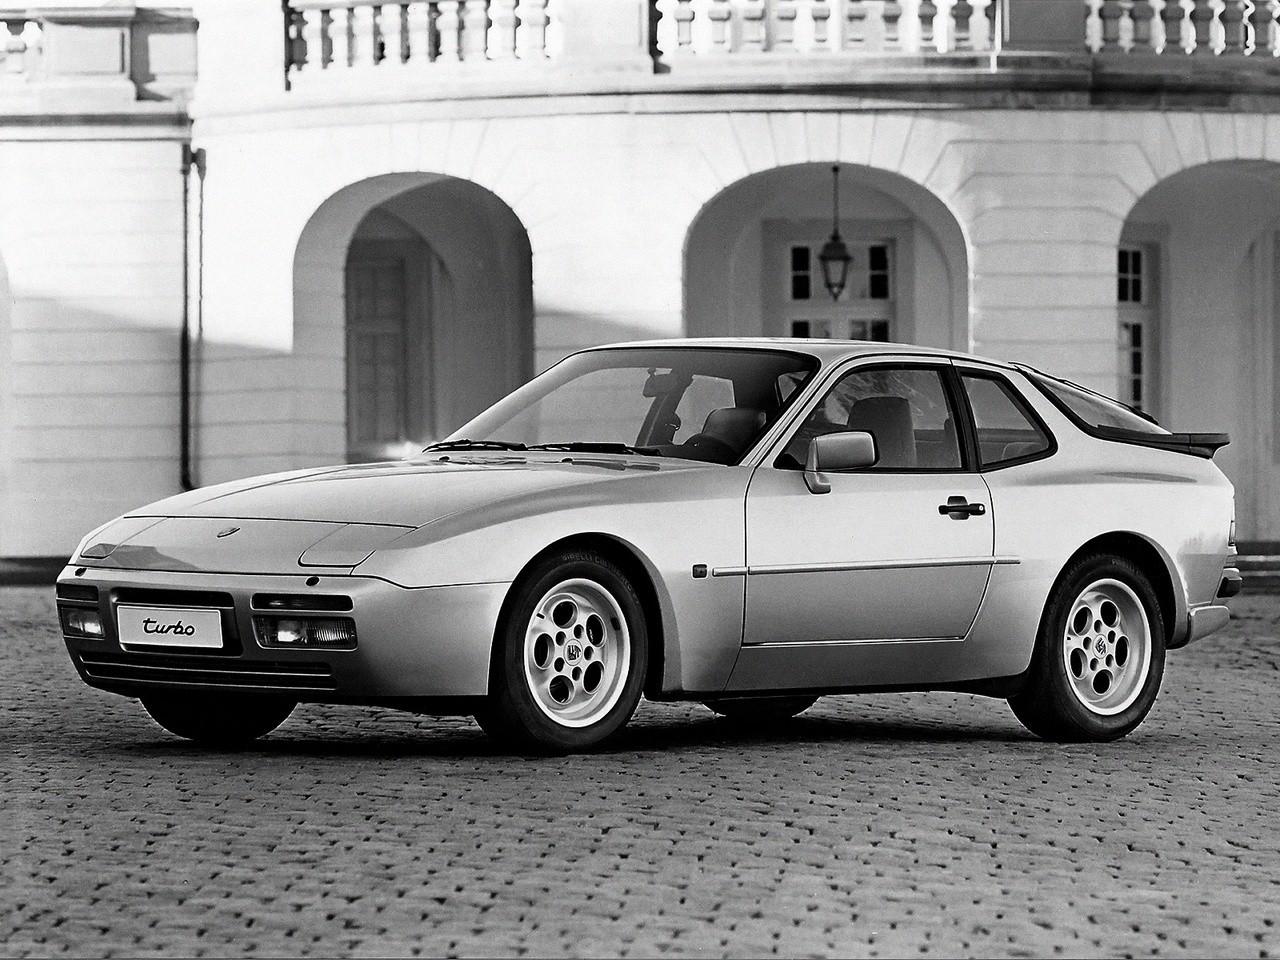 porsche 944 turbo turbo s 951 1985 1986 1987 1988 1989 1990 autoevolution. Black Bedroom Furniture Sets. Home Design Ideas